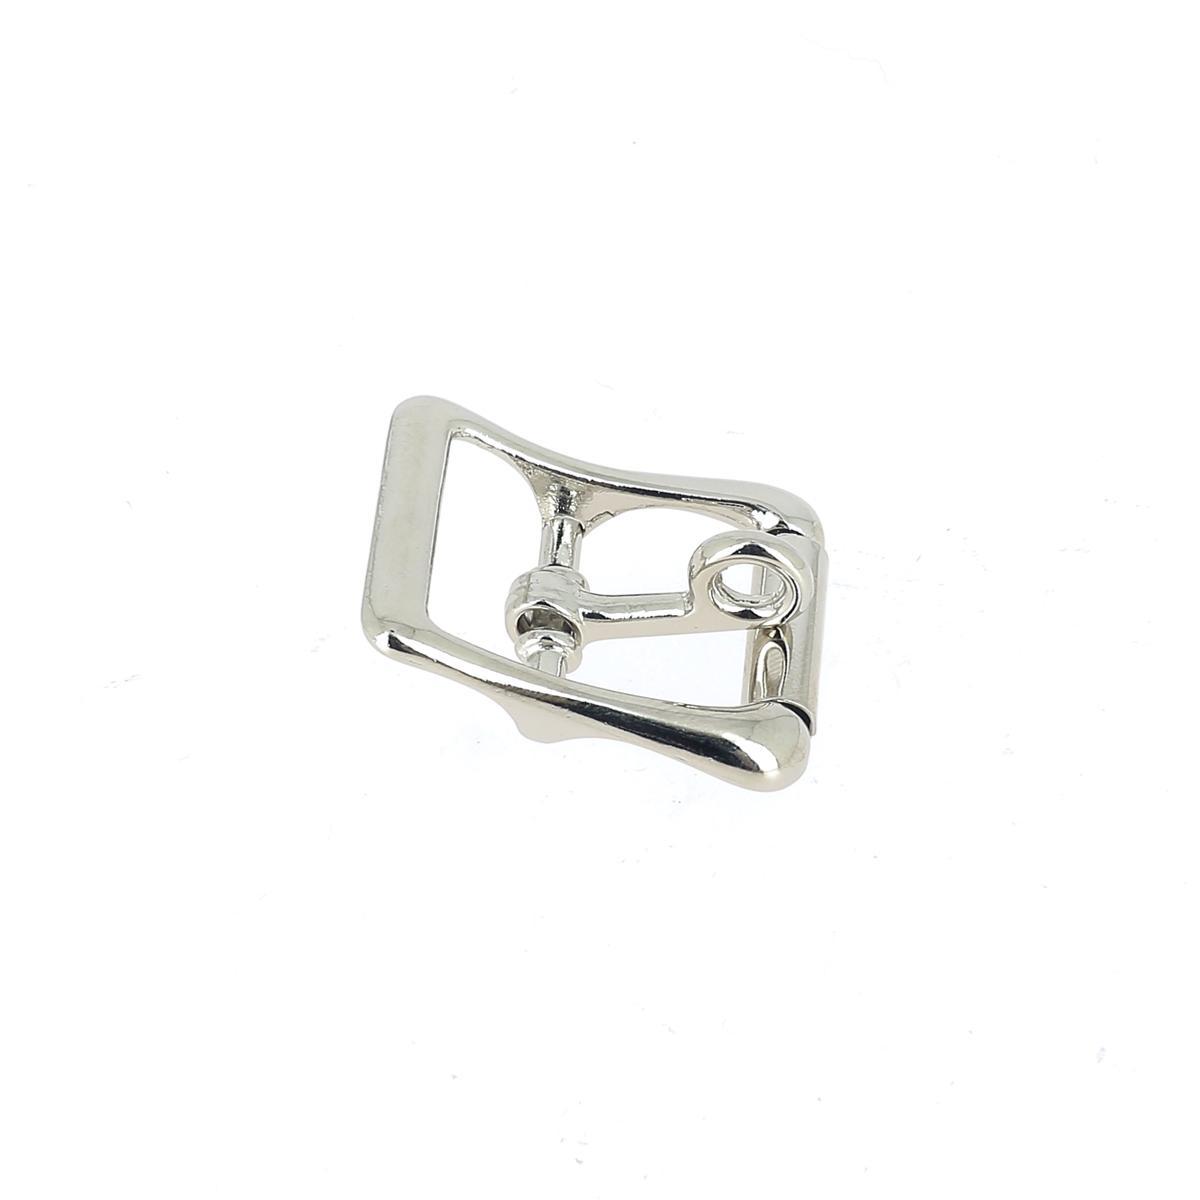 Boucle de ceinture double à ardillon de verrouillage - NICKELÉ - Tandy Leather